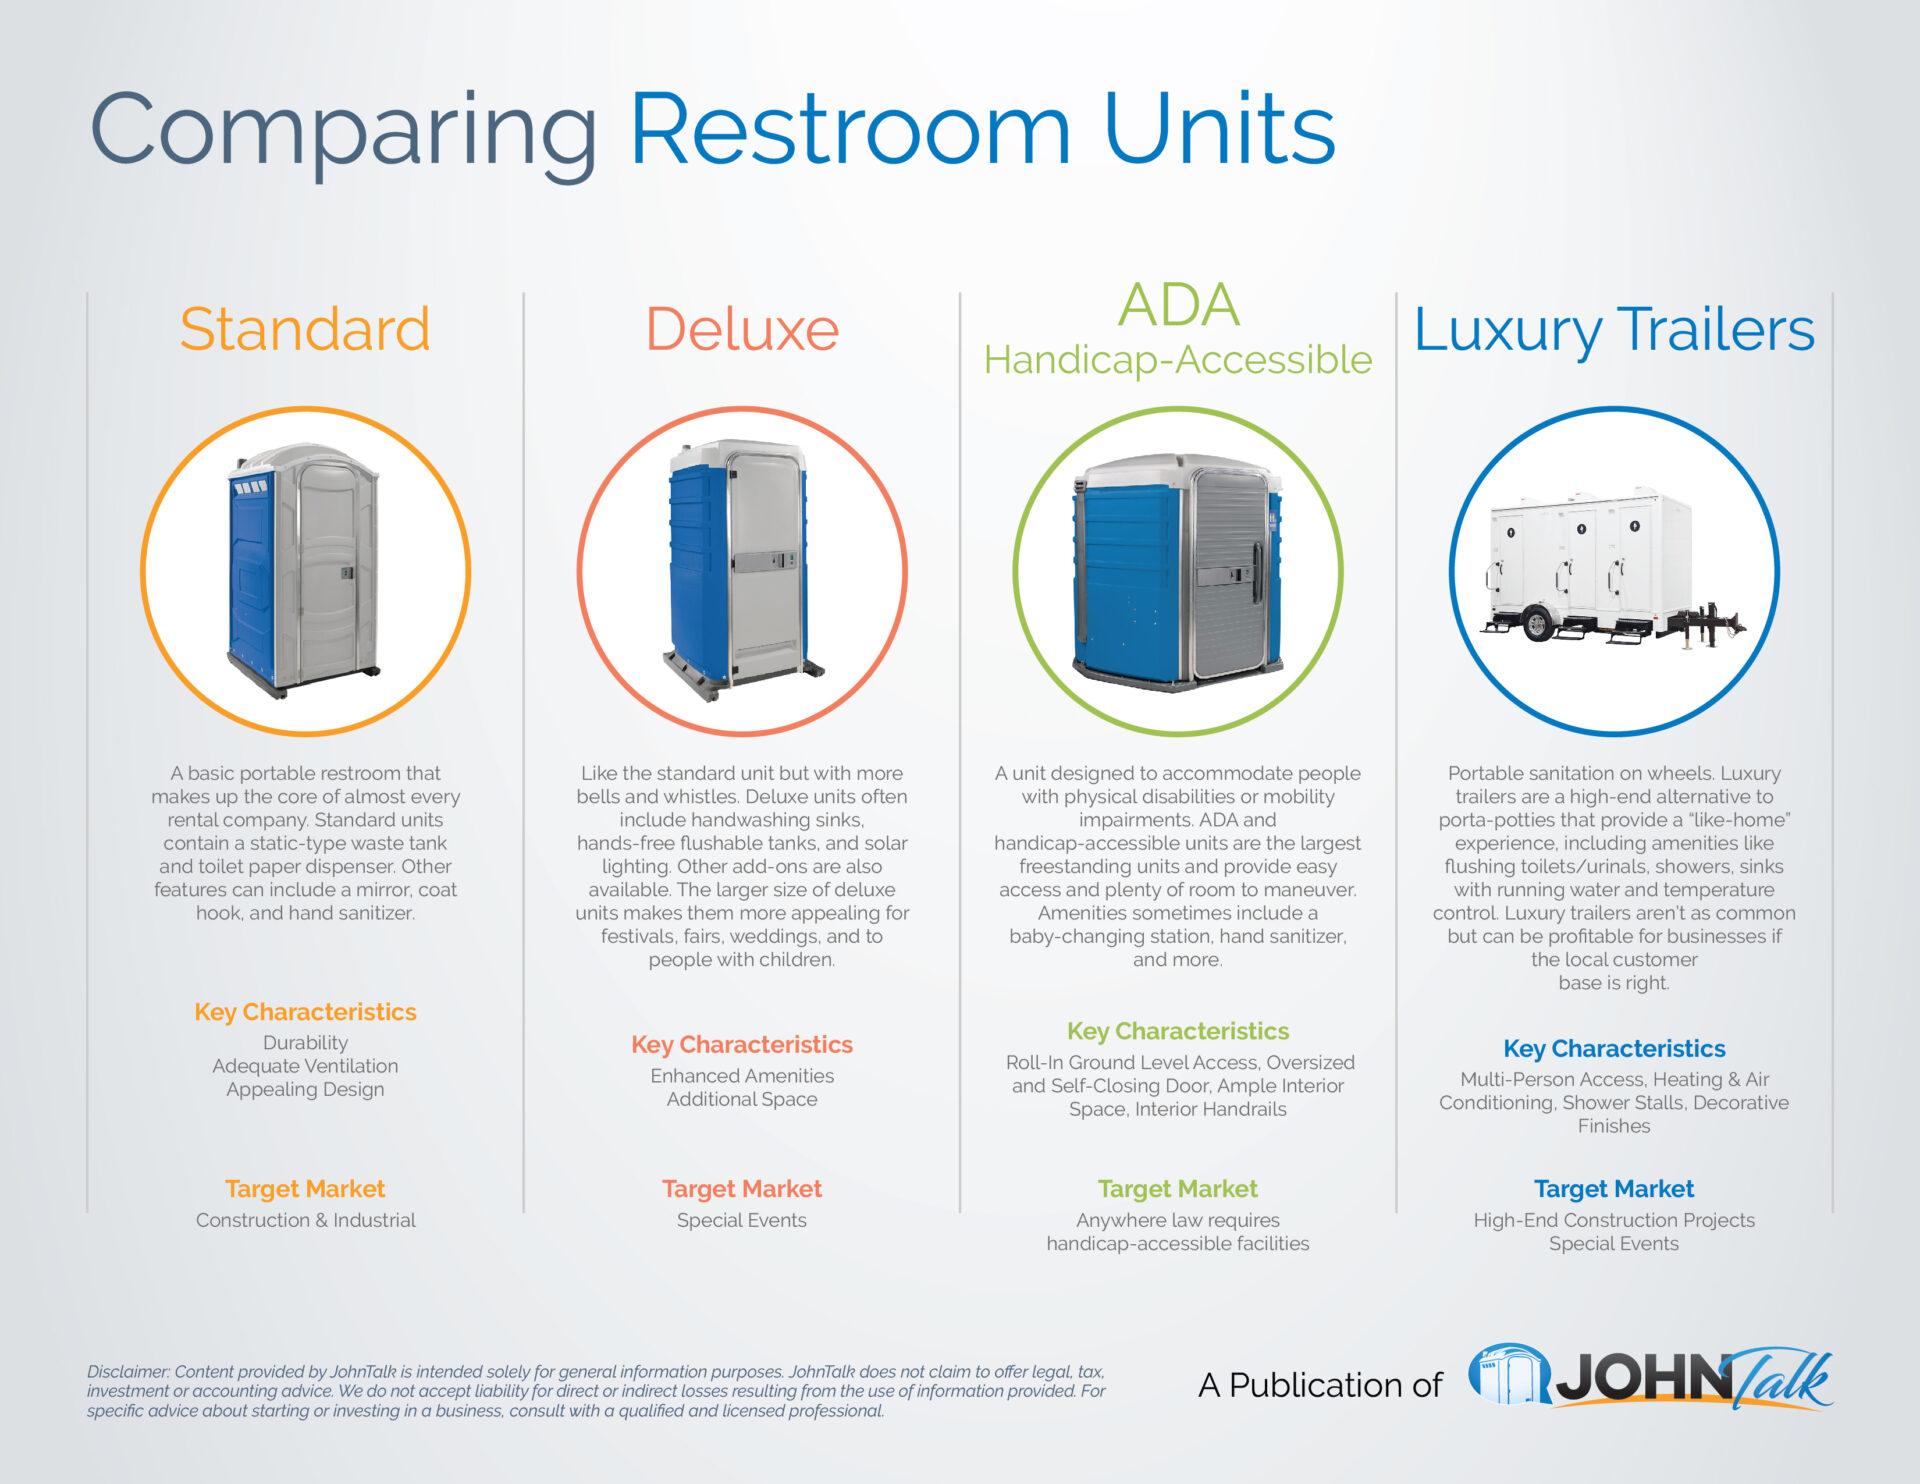 Comparing Restroom Units